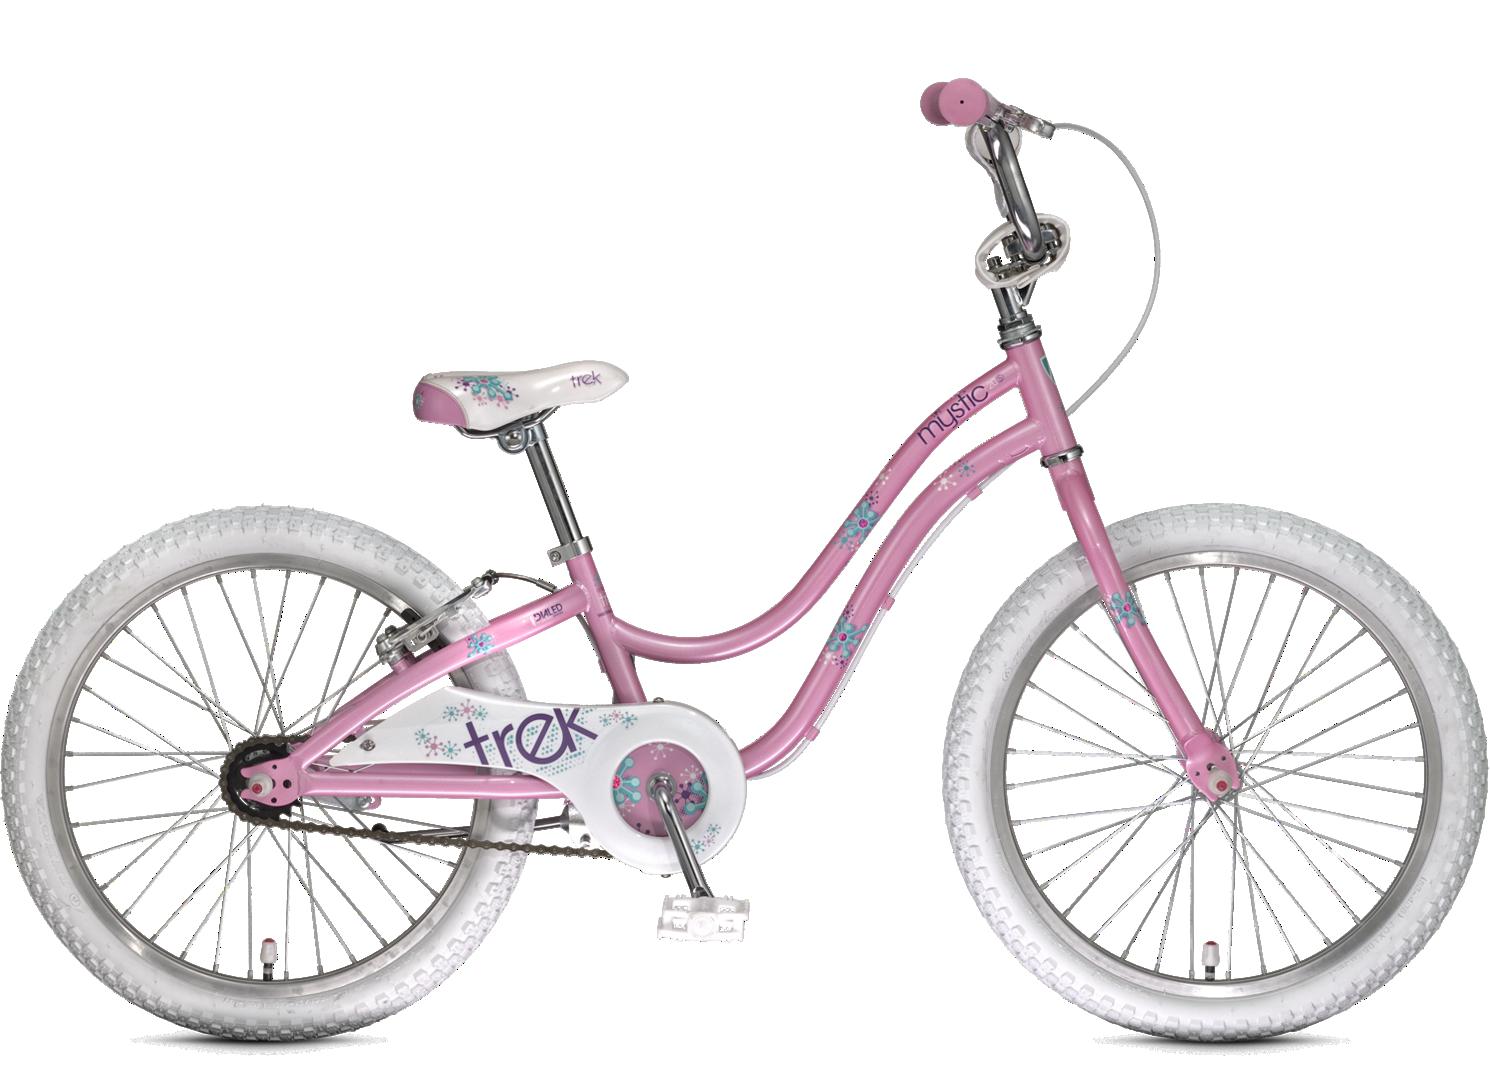 bbfc12a576d 2013 Mystic 20 S - Bike Archive - Trek Bicycle